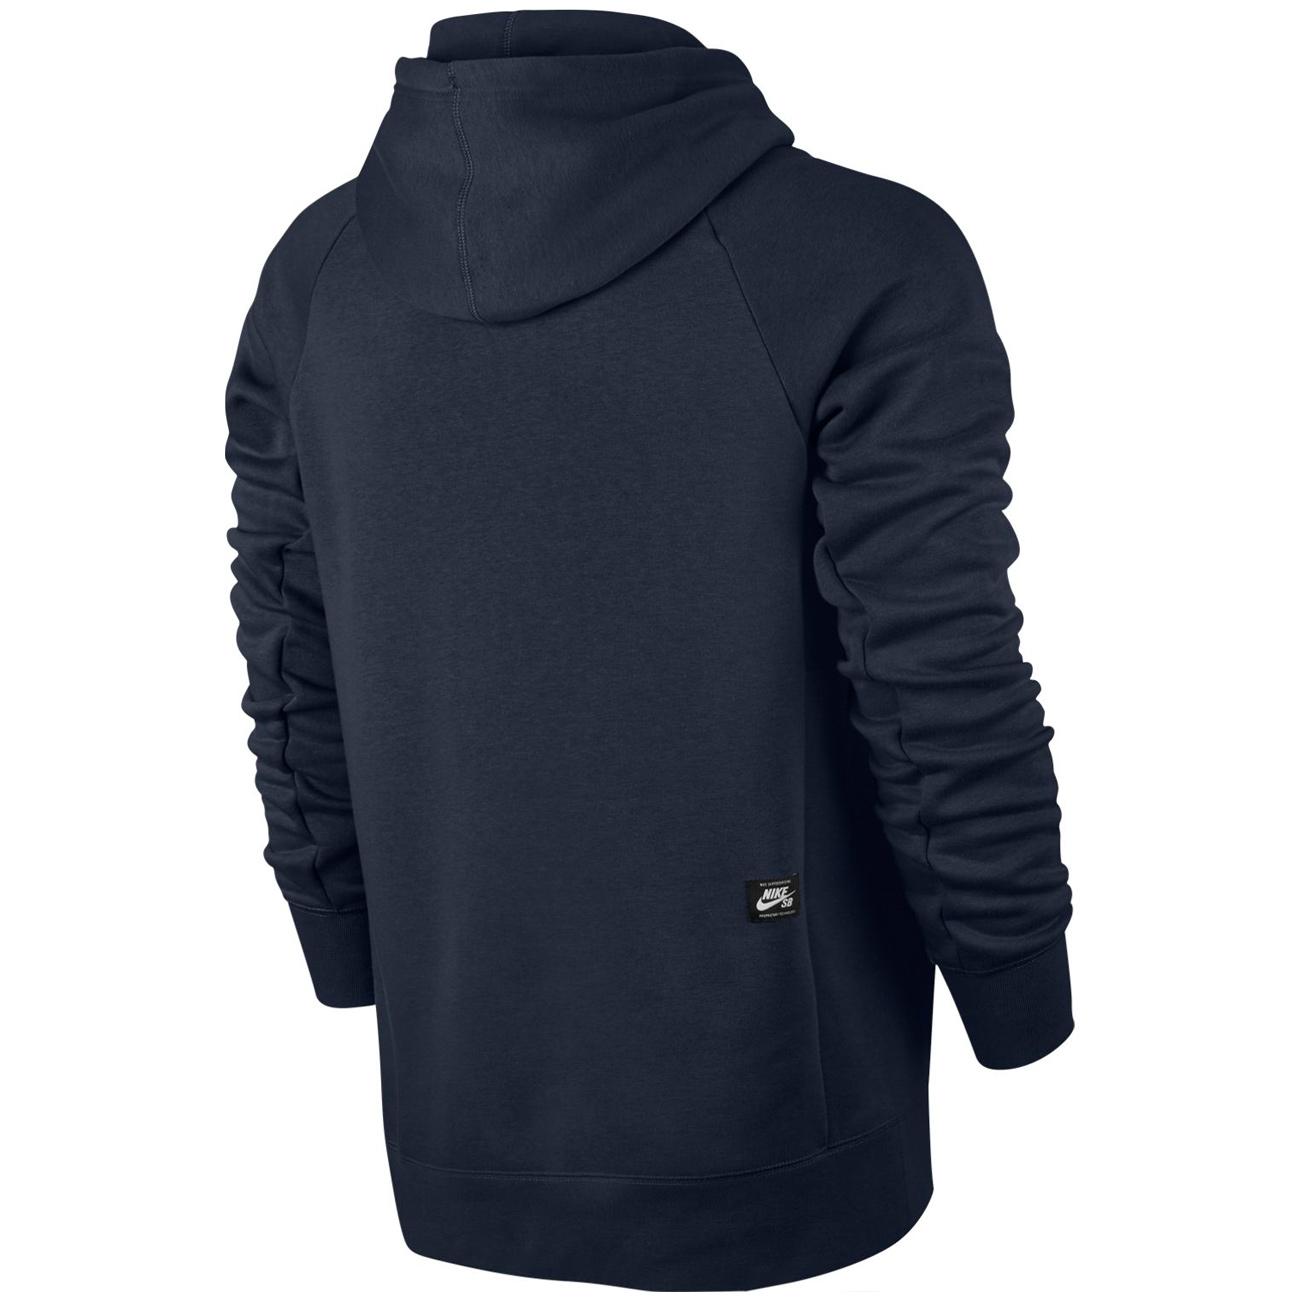 nike hoodie sale herren full zip sweater. Black Bedroom Furniture Sets. Home Design Ideas